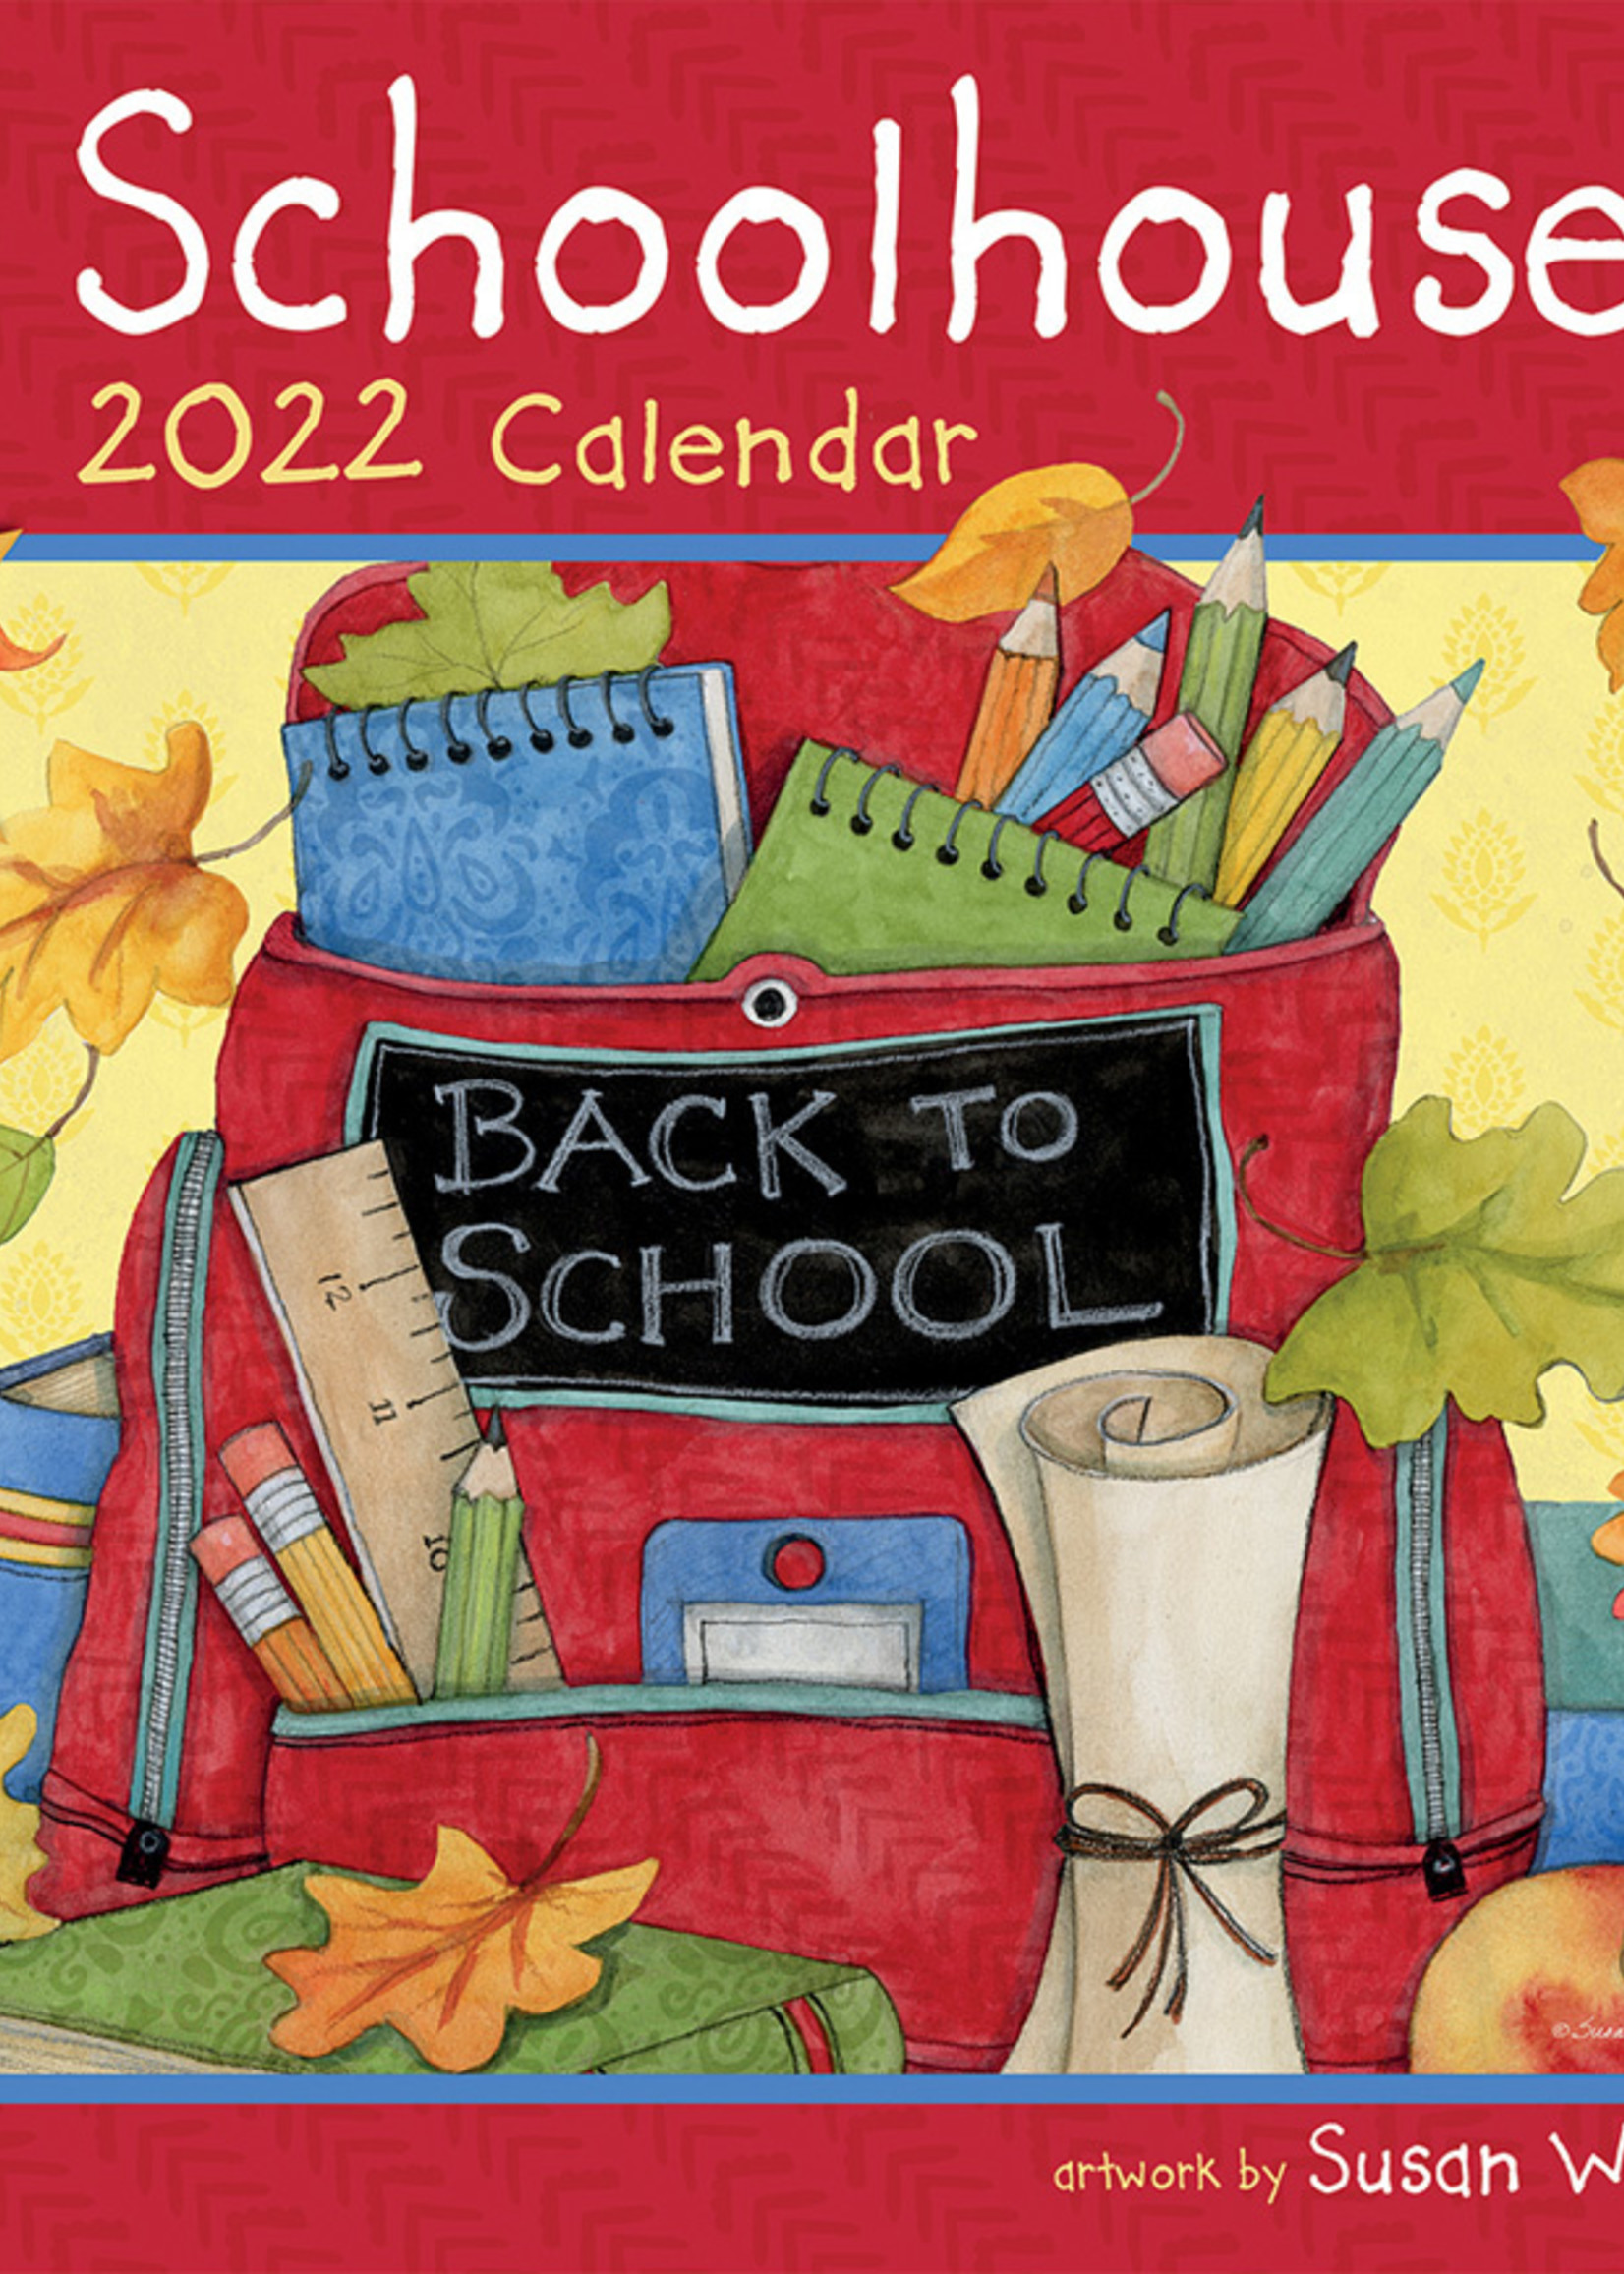 Schoolhouse Calender 2022